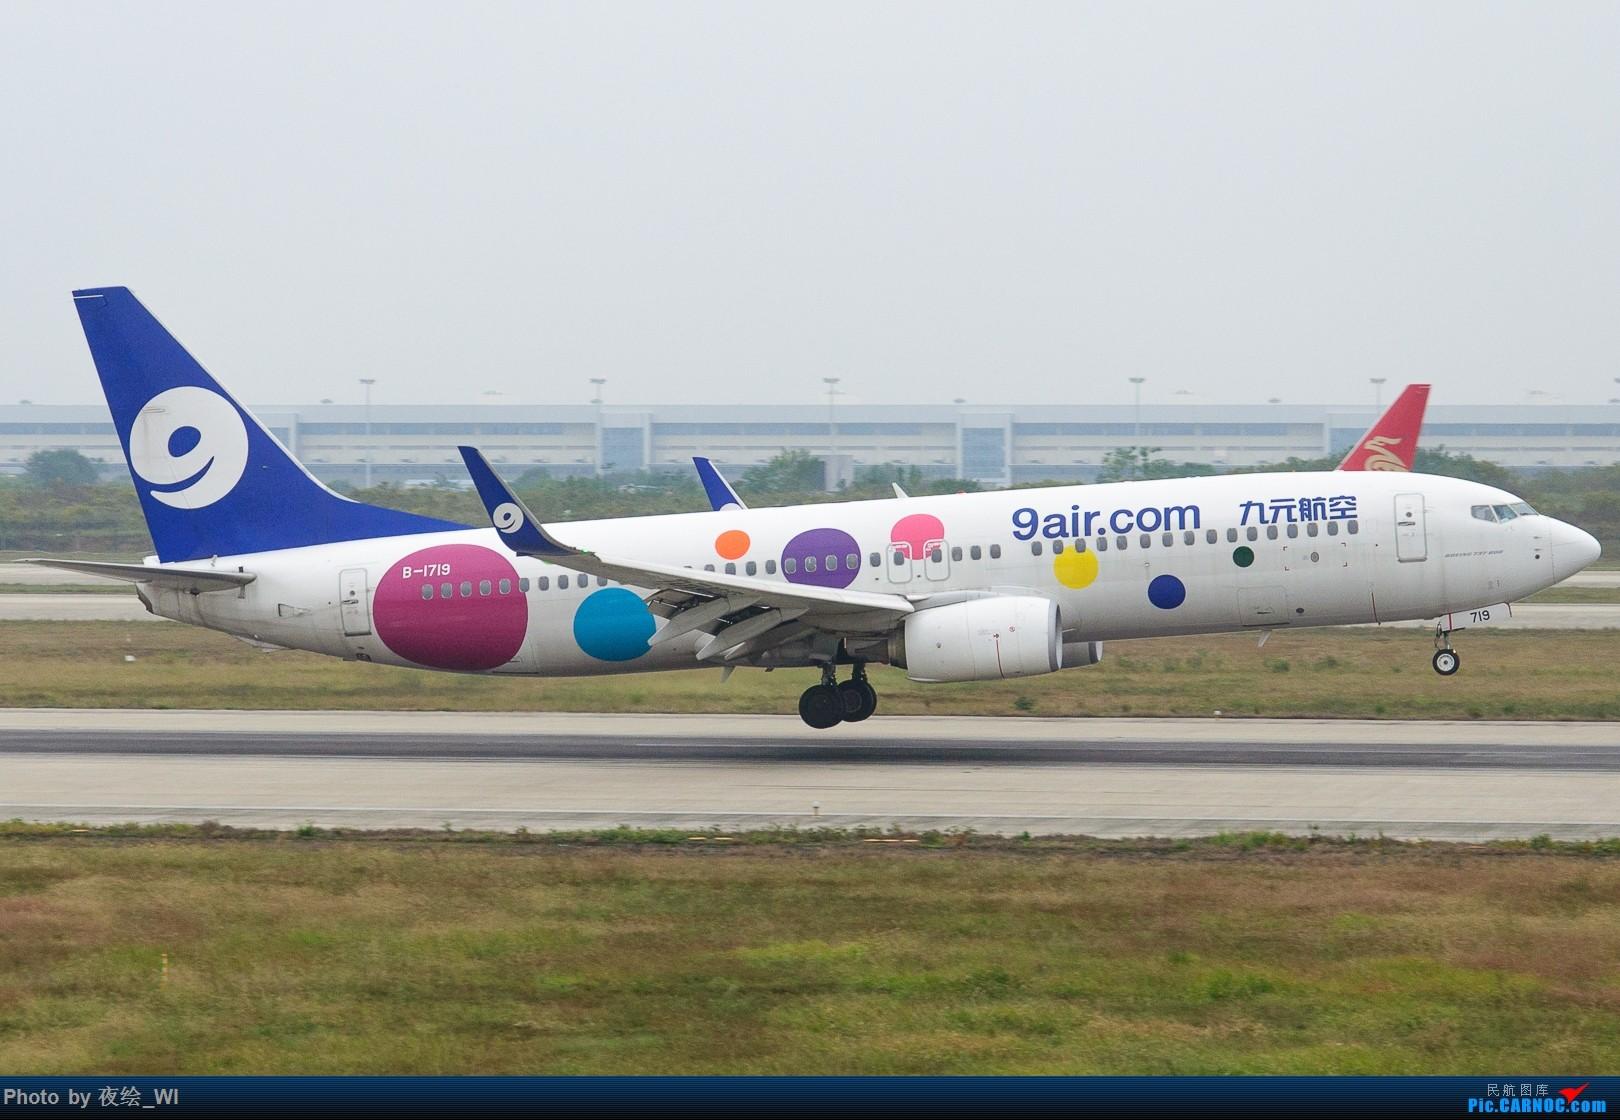 Re:[原创]【NKG】生日也要拍飞机,珍惜南京久违的单跑运行时光 BOEING 737-800 B-1719 中国南京禄口国际机场